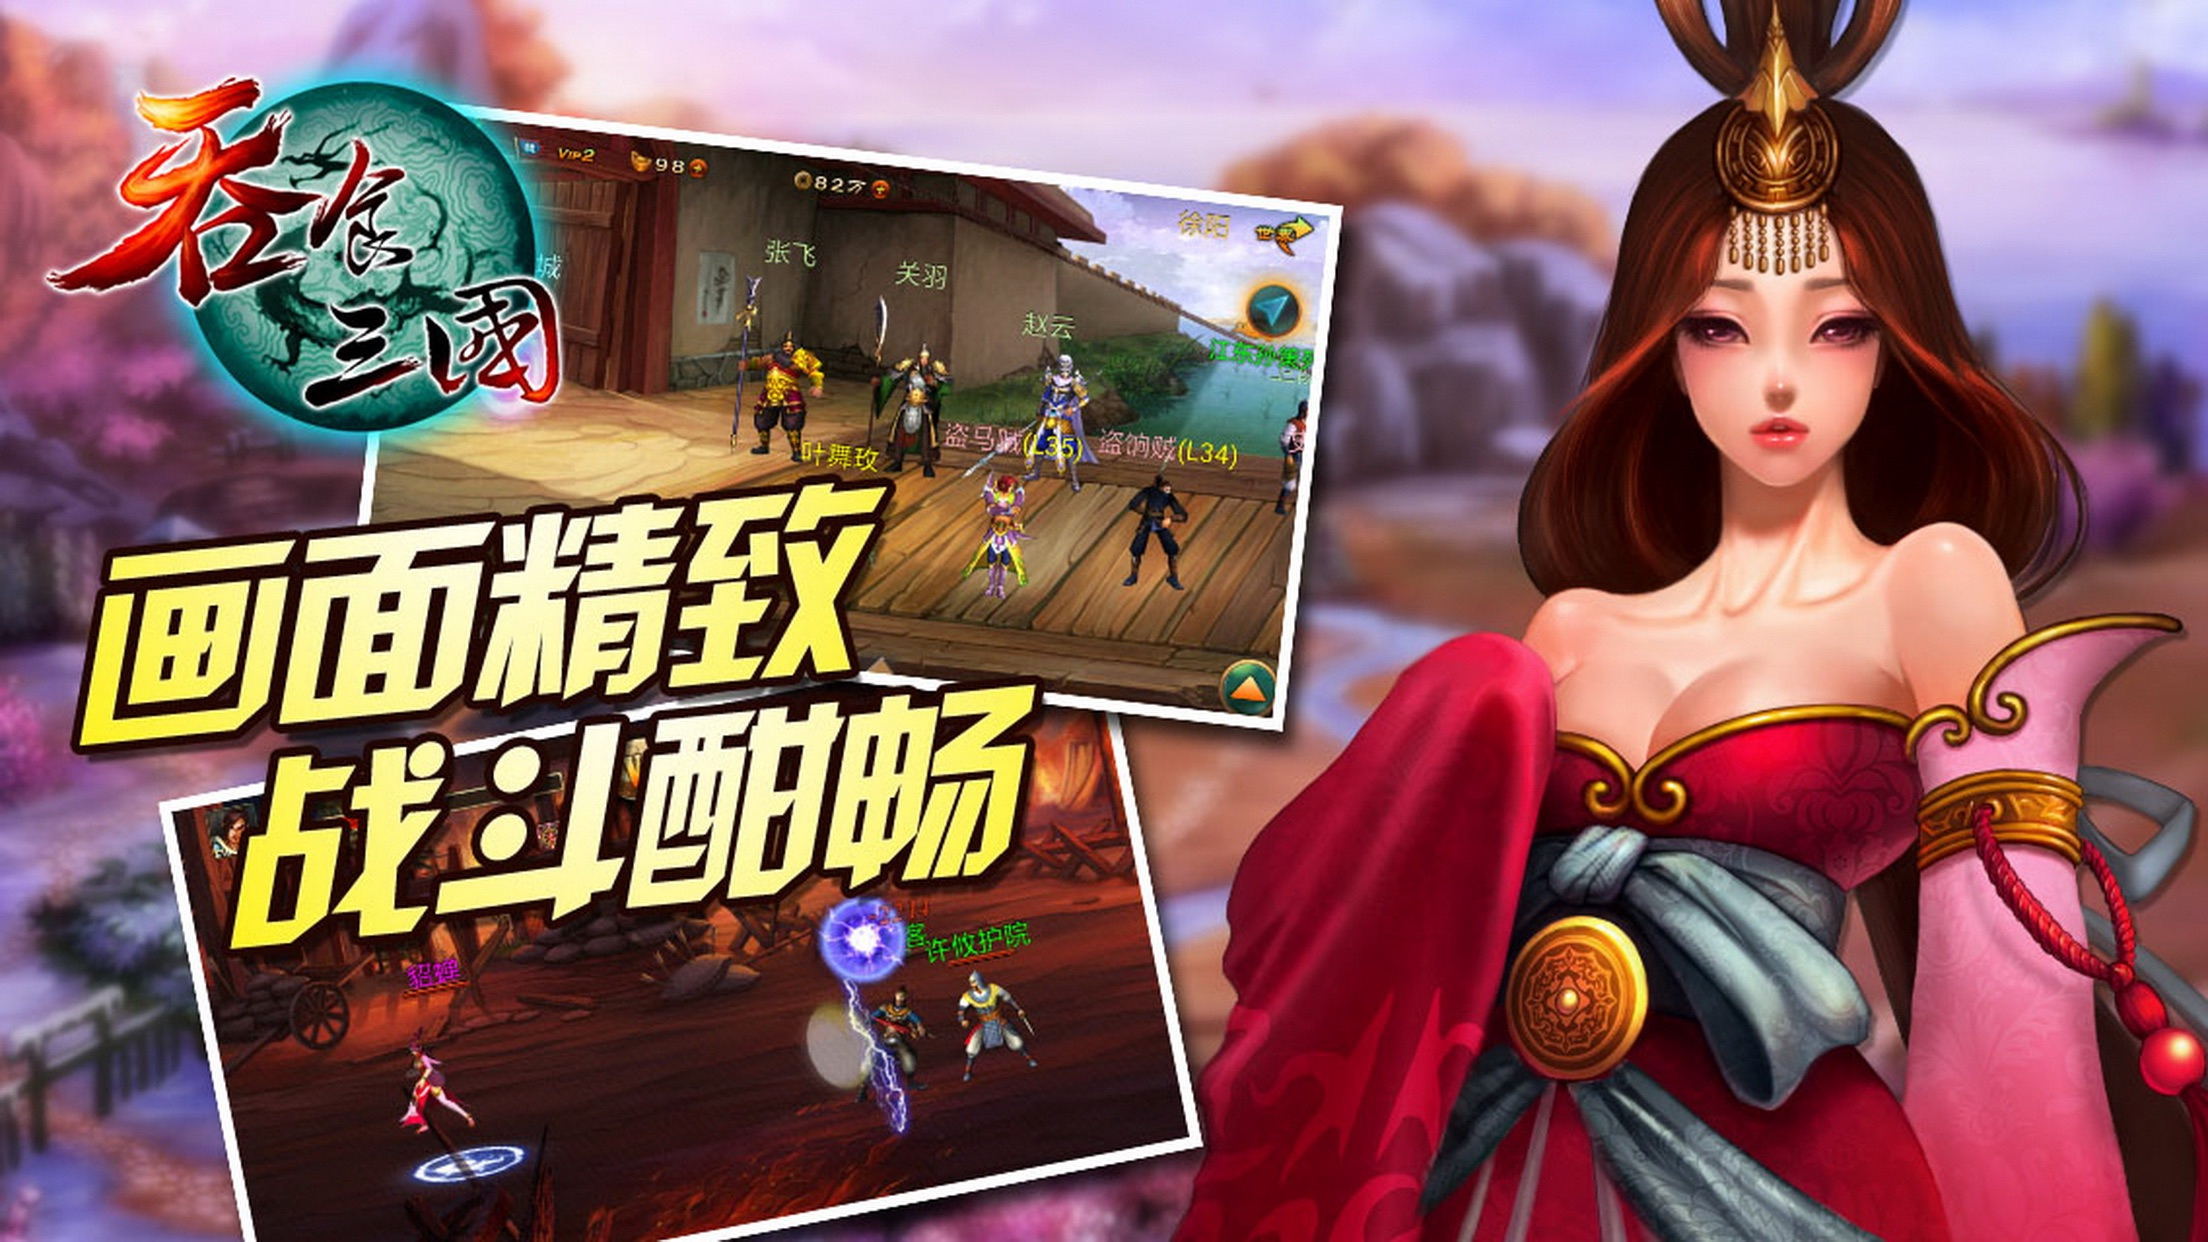 吞食三国 Screenshot